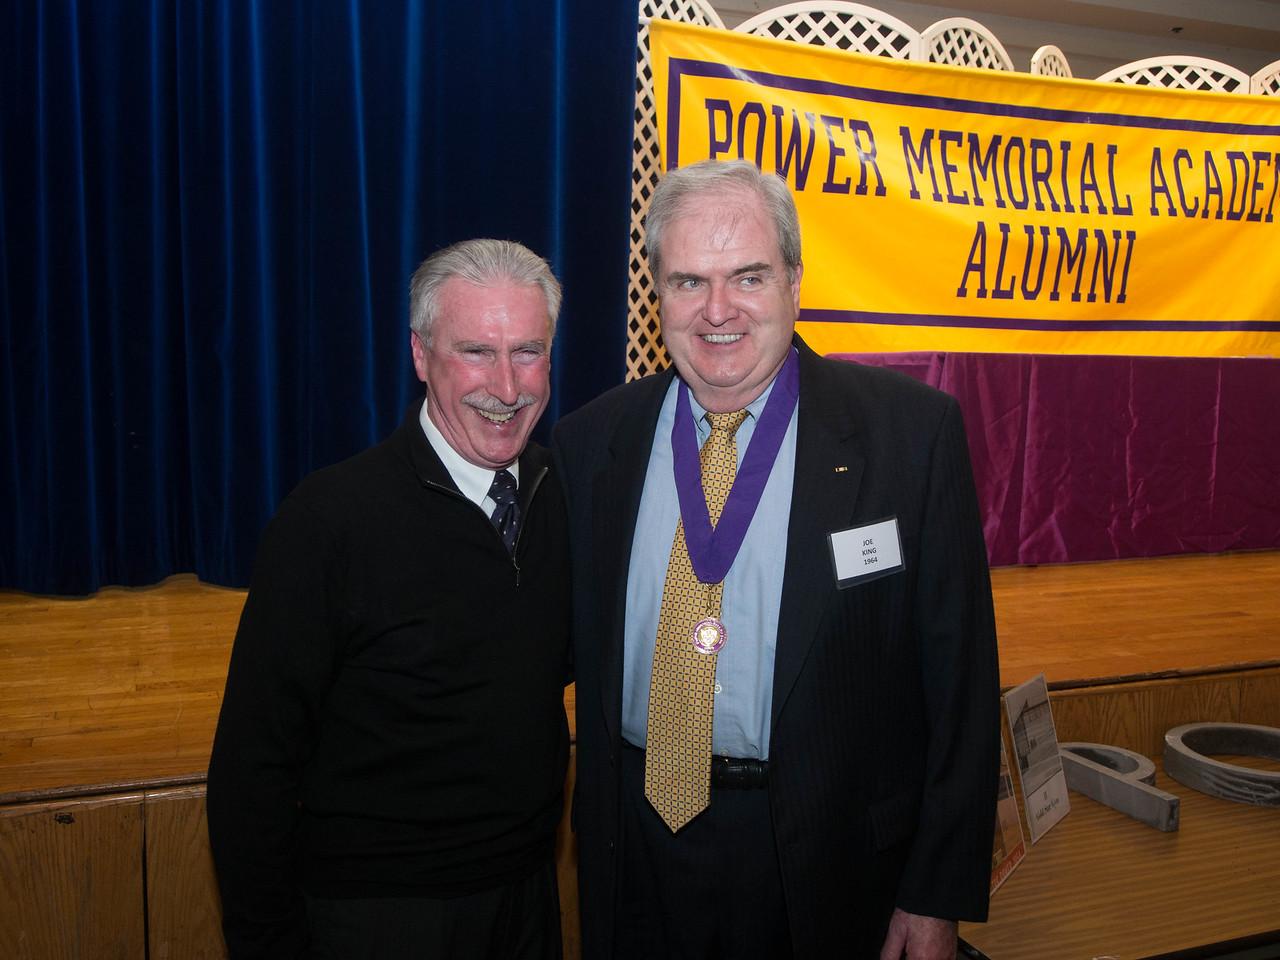 Bill Gleeson '64 and Joe King '64